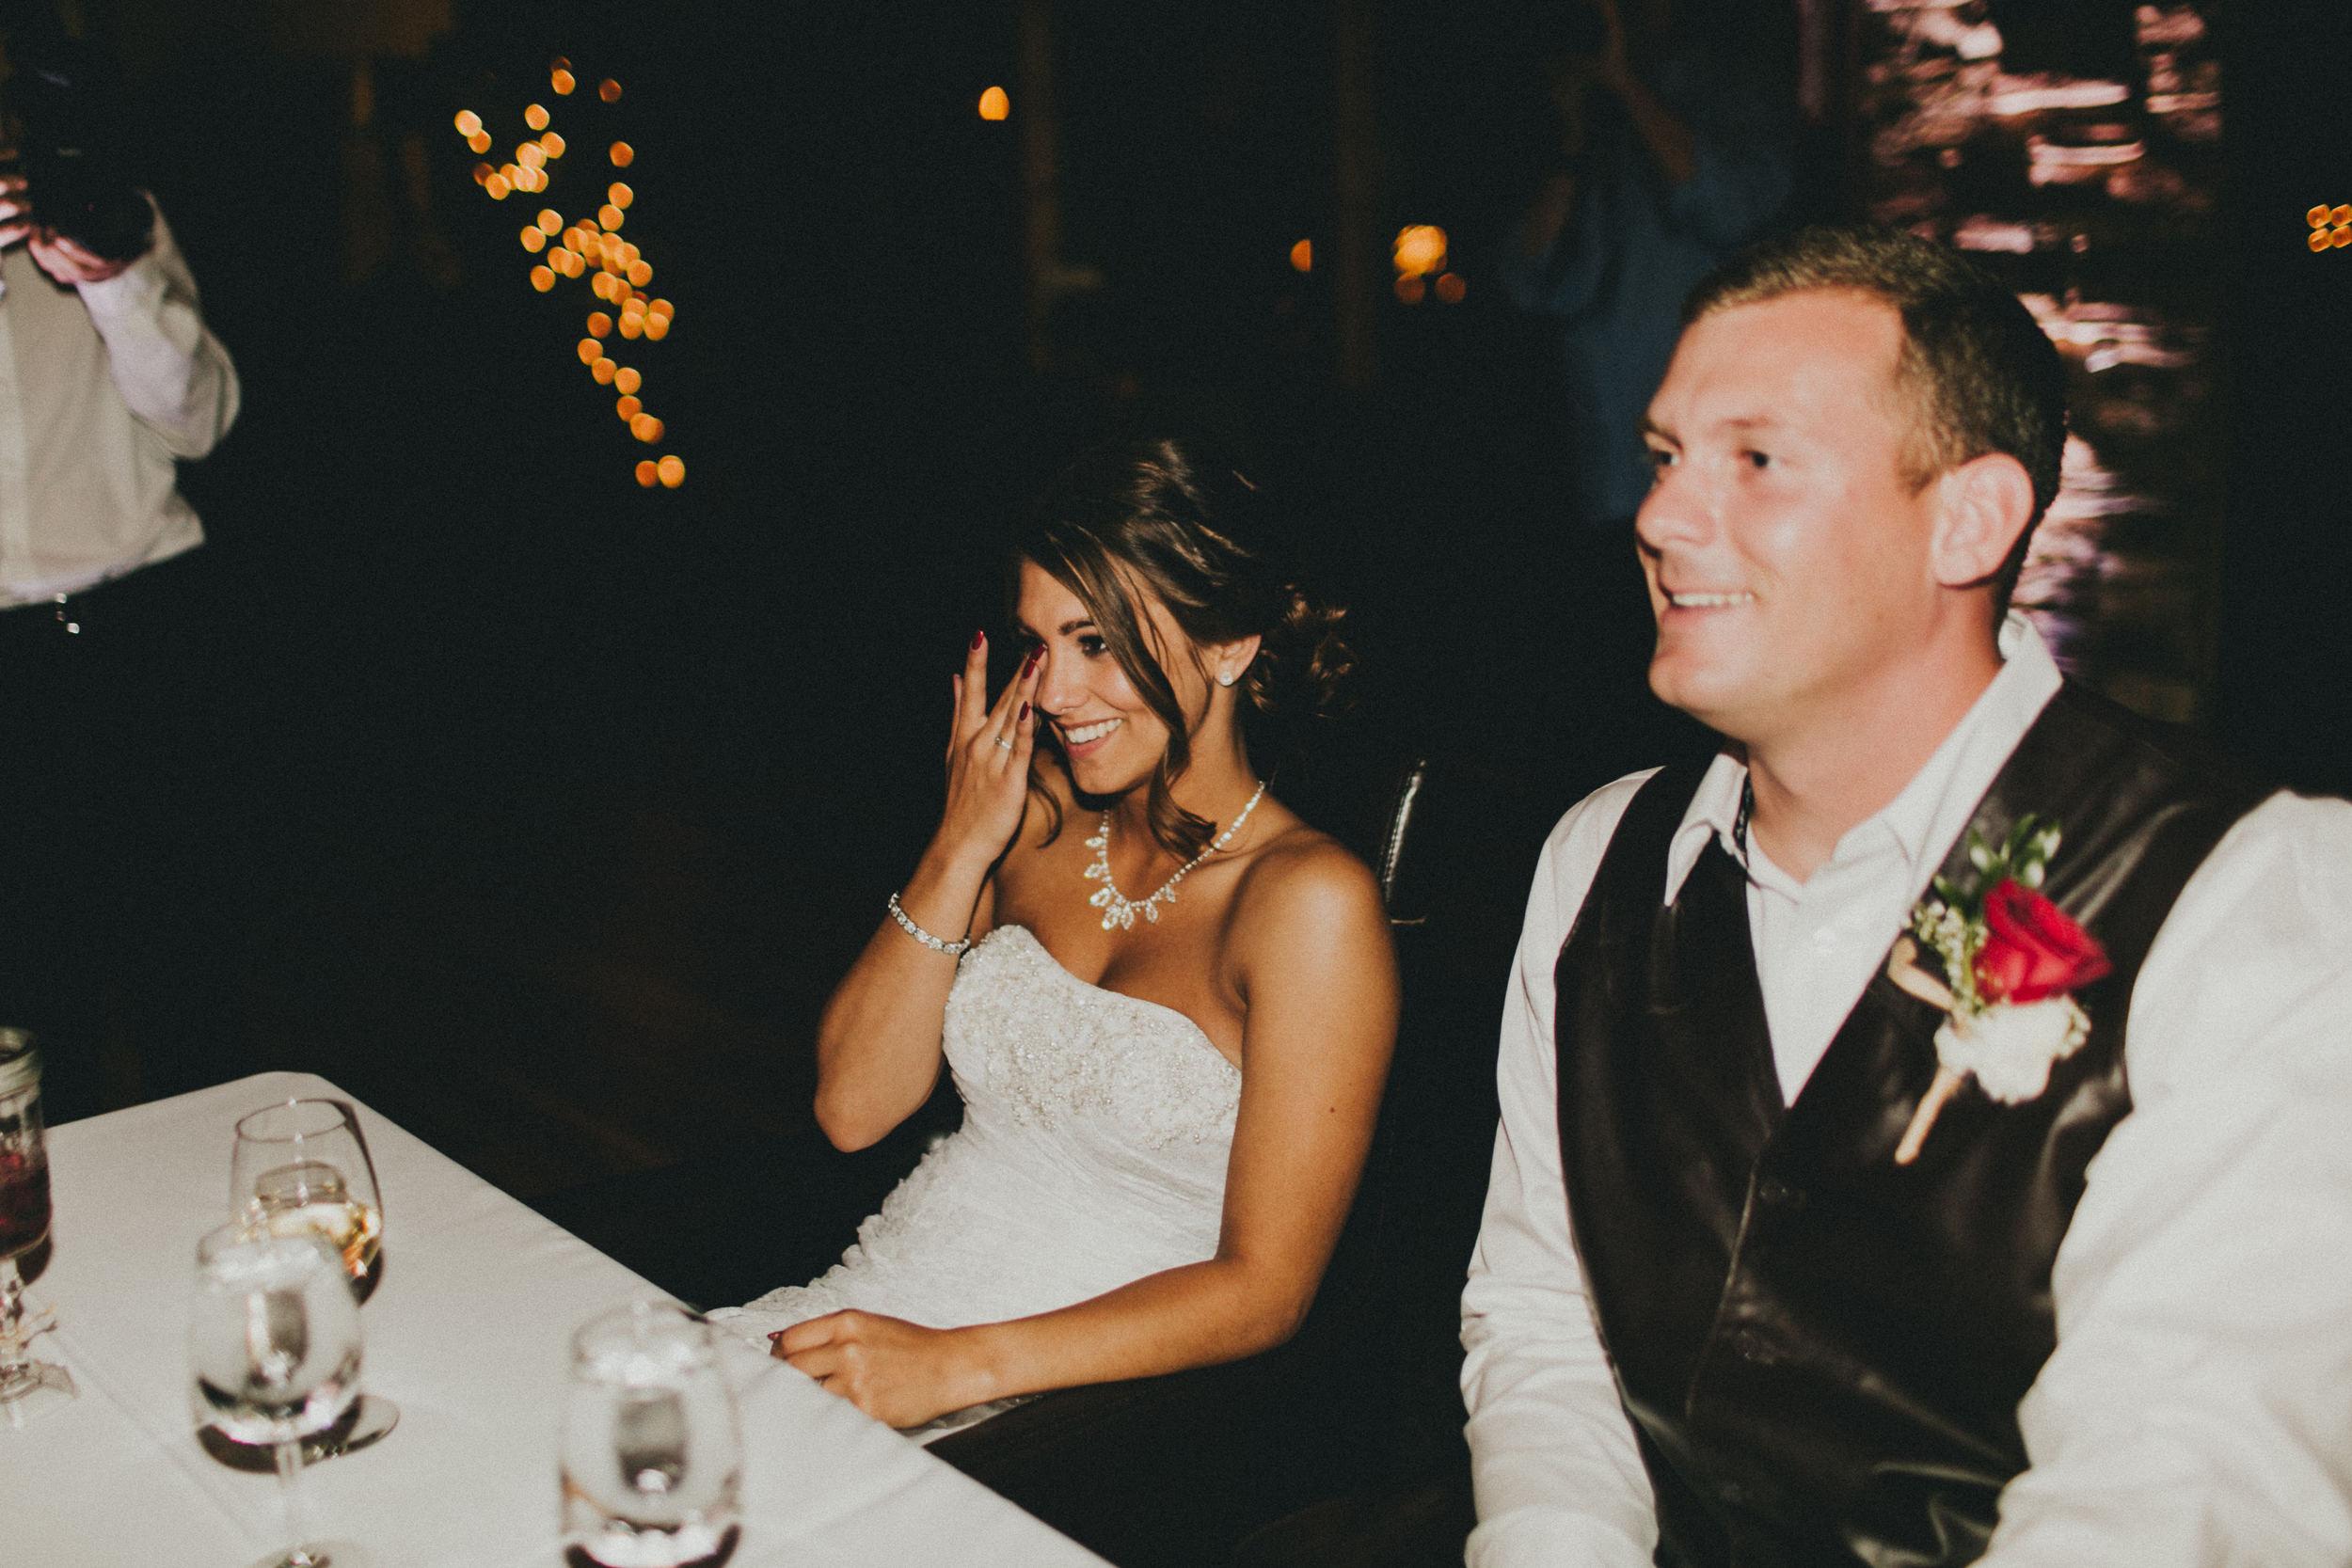 Cheyenne + Jordan - Wedding, Natalie Griffo (110 of 157).jpg